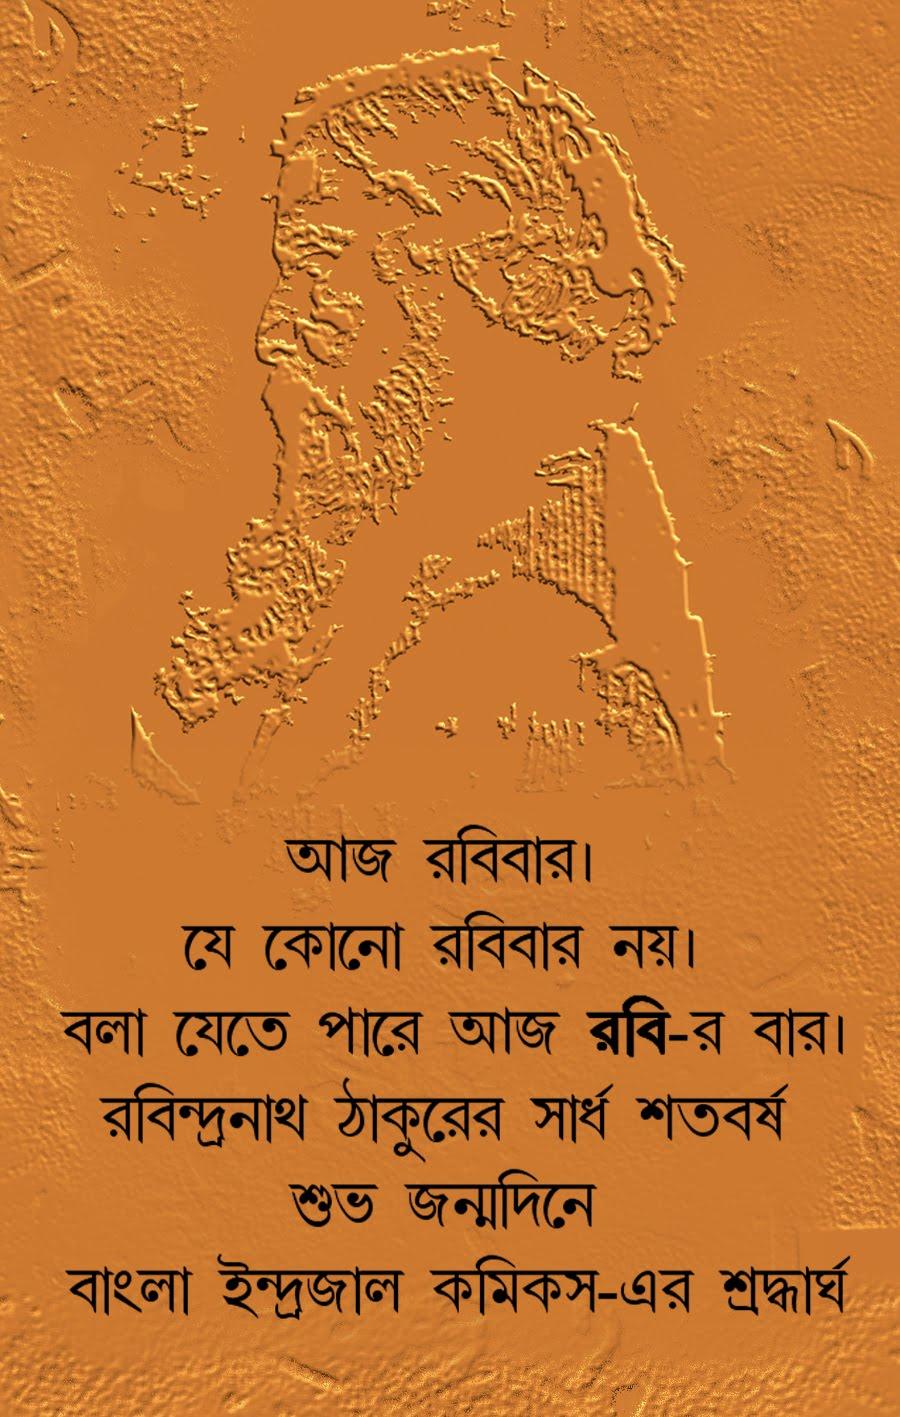 essay on 150th birth anniversary of rabindranath tagore